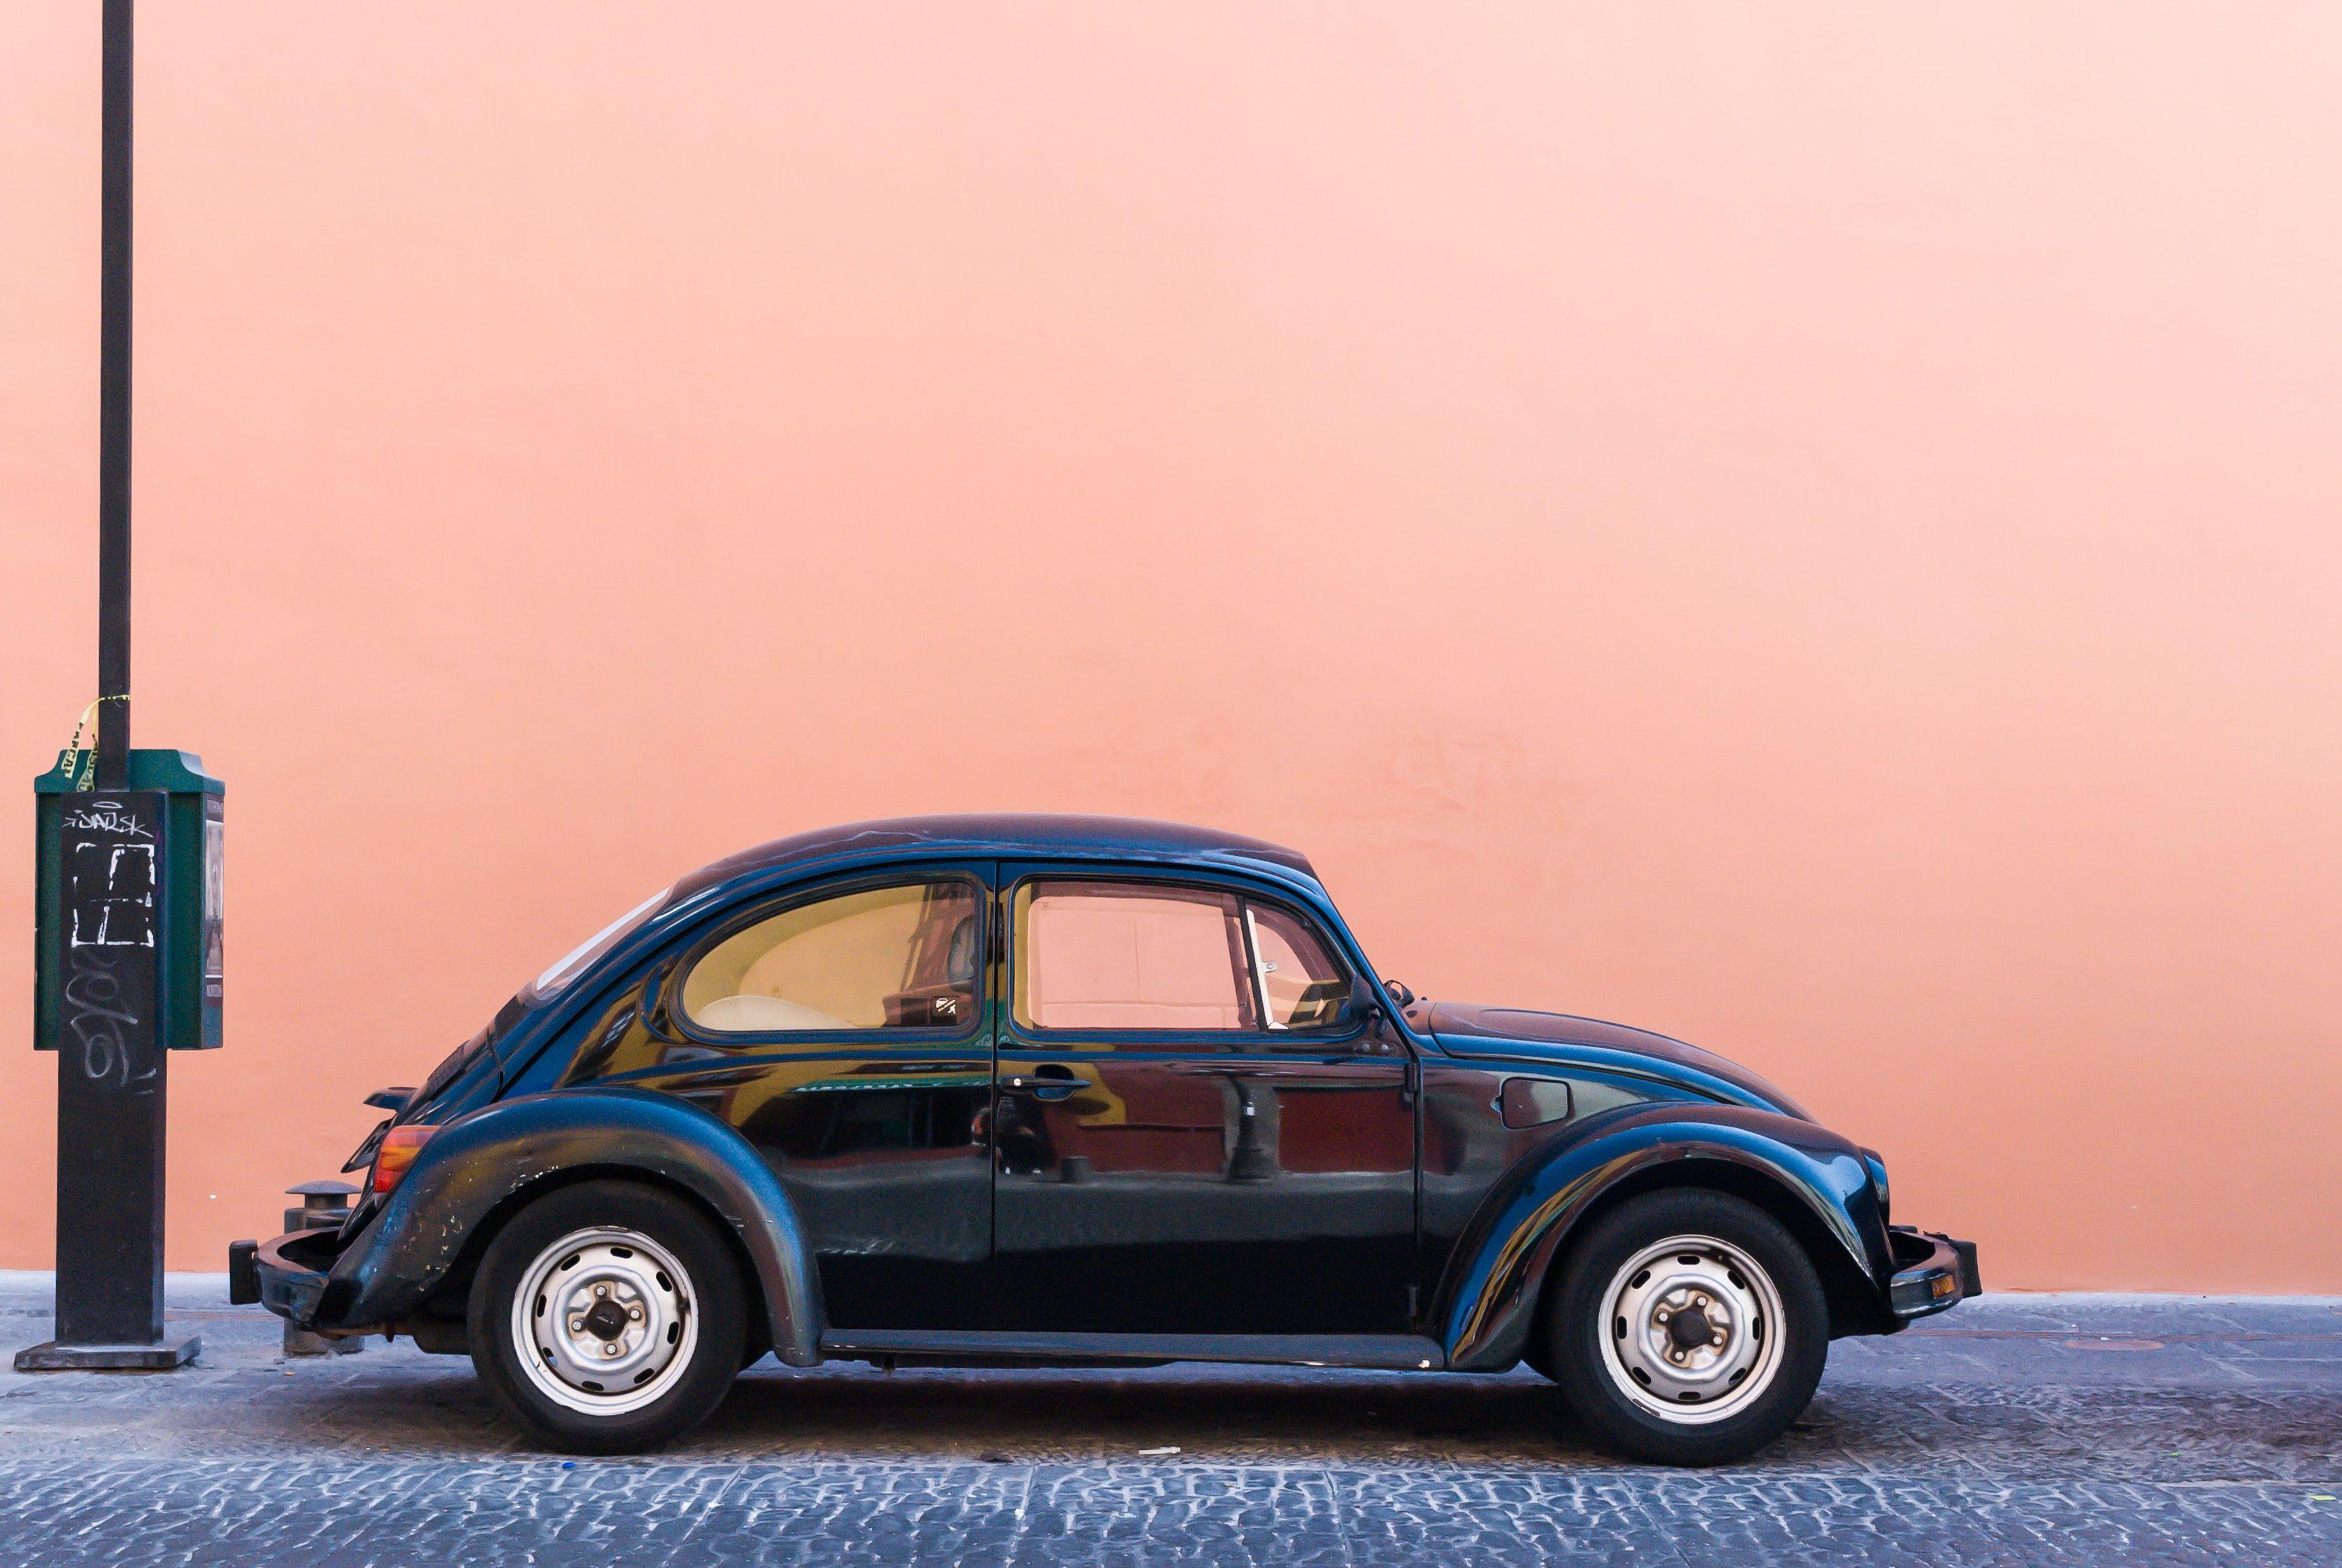 Lanmodo Vast 1080p Automotive Night Vision System Beetle Car